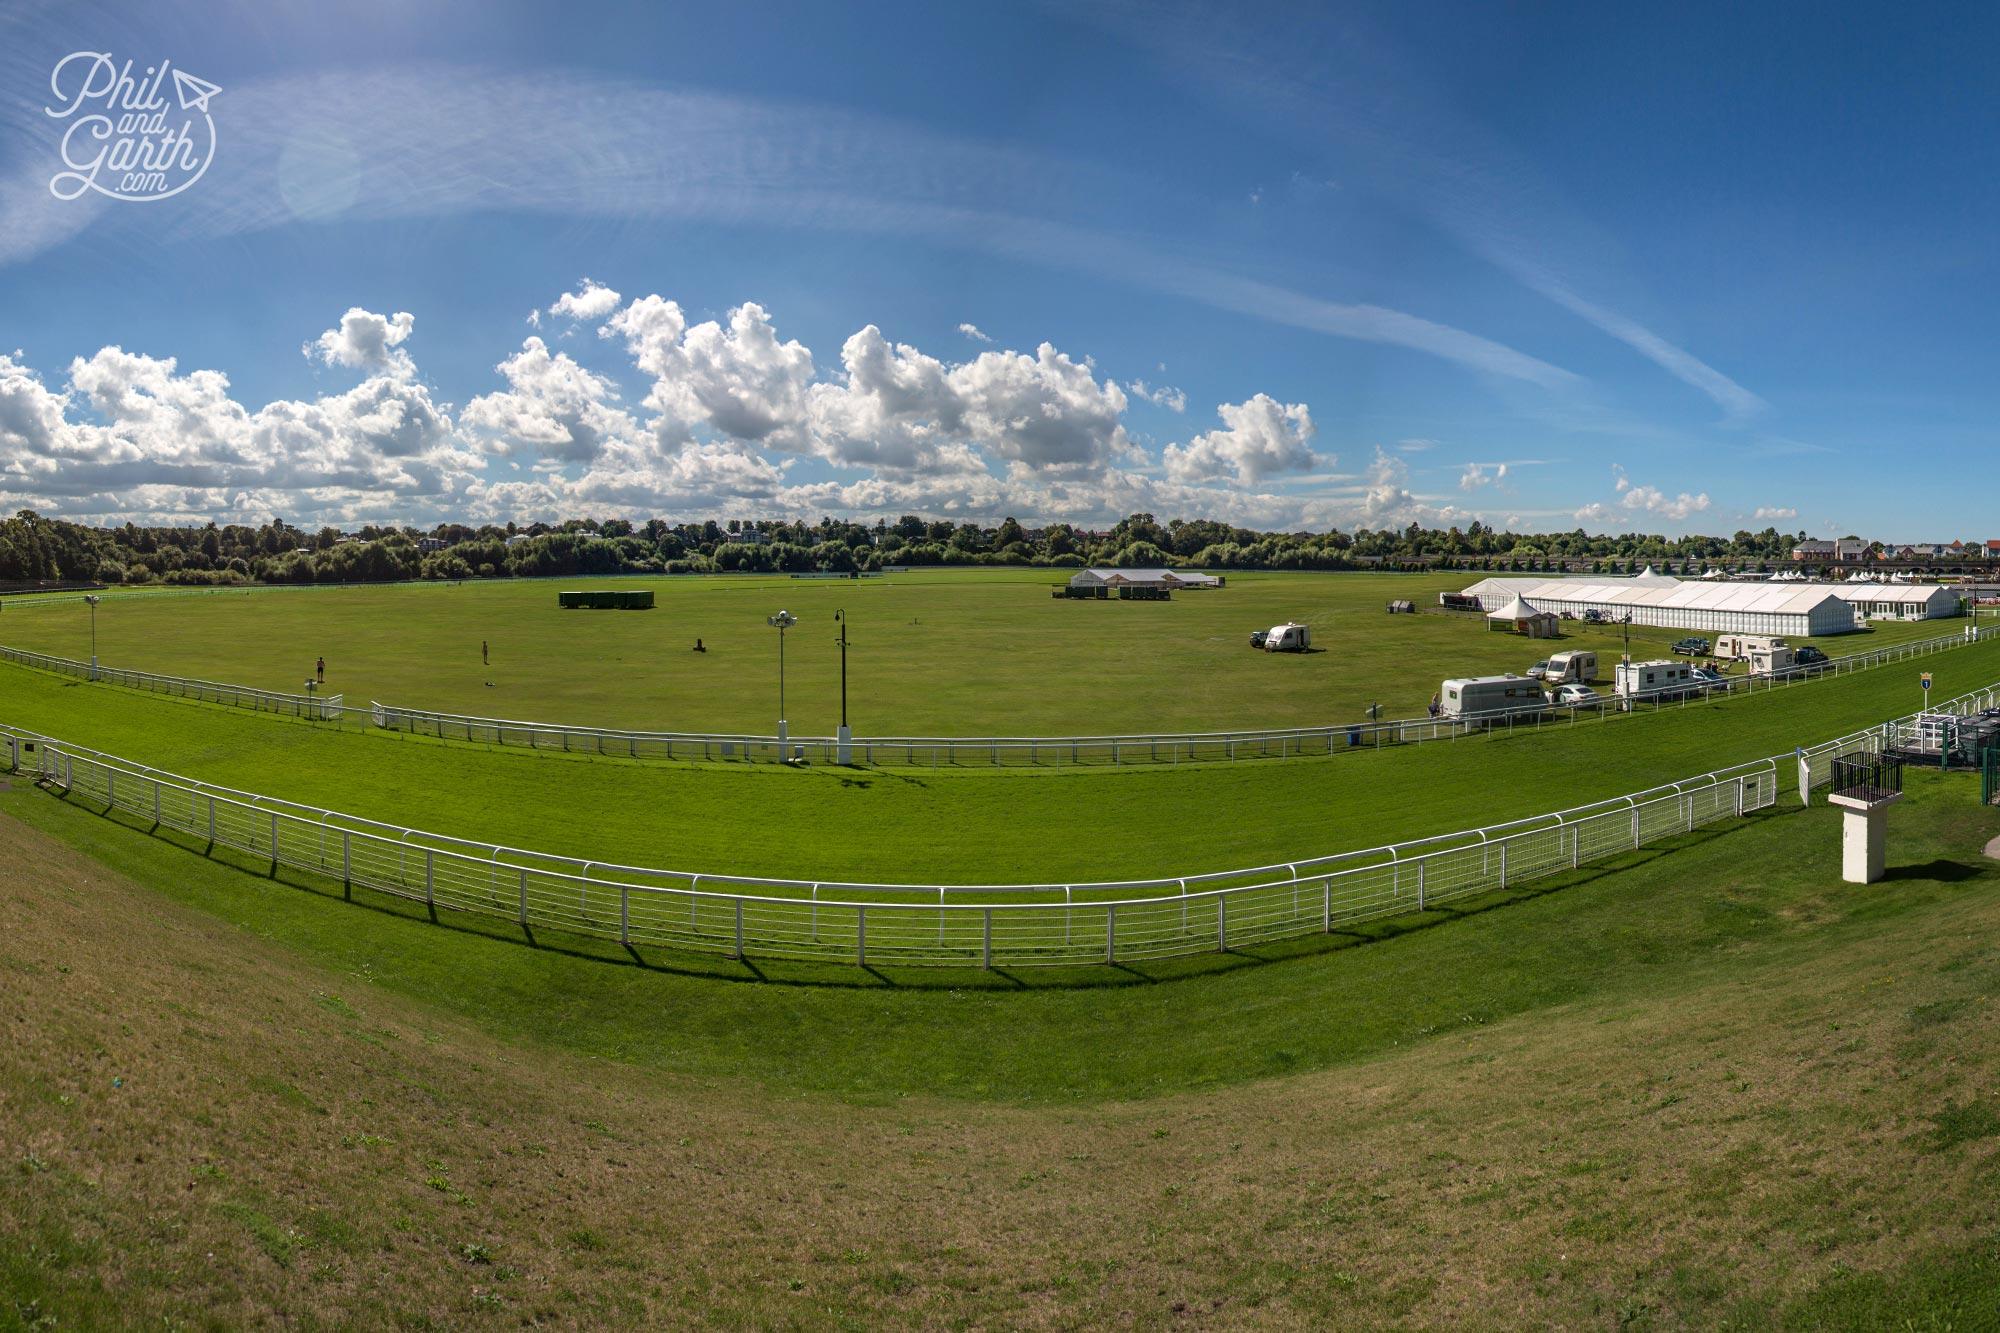 Britain's oldest racecourse